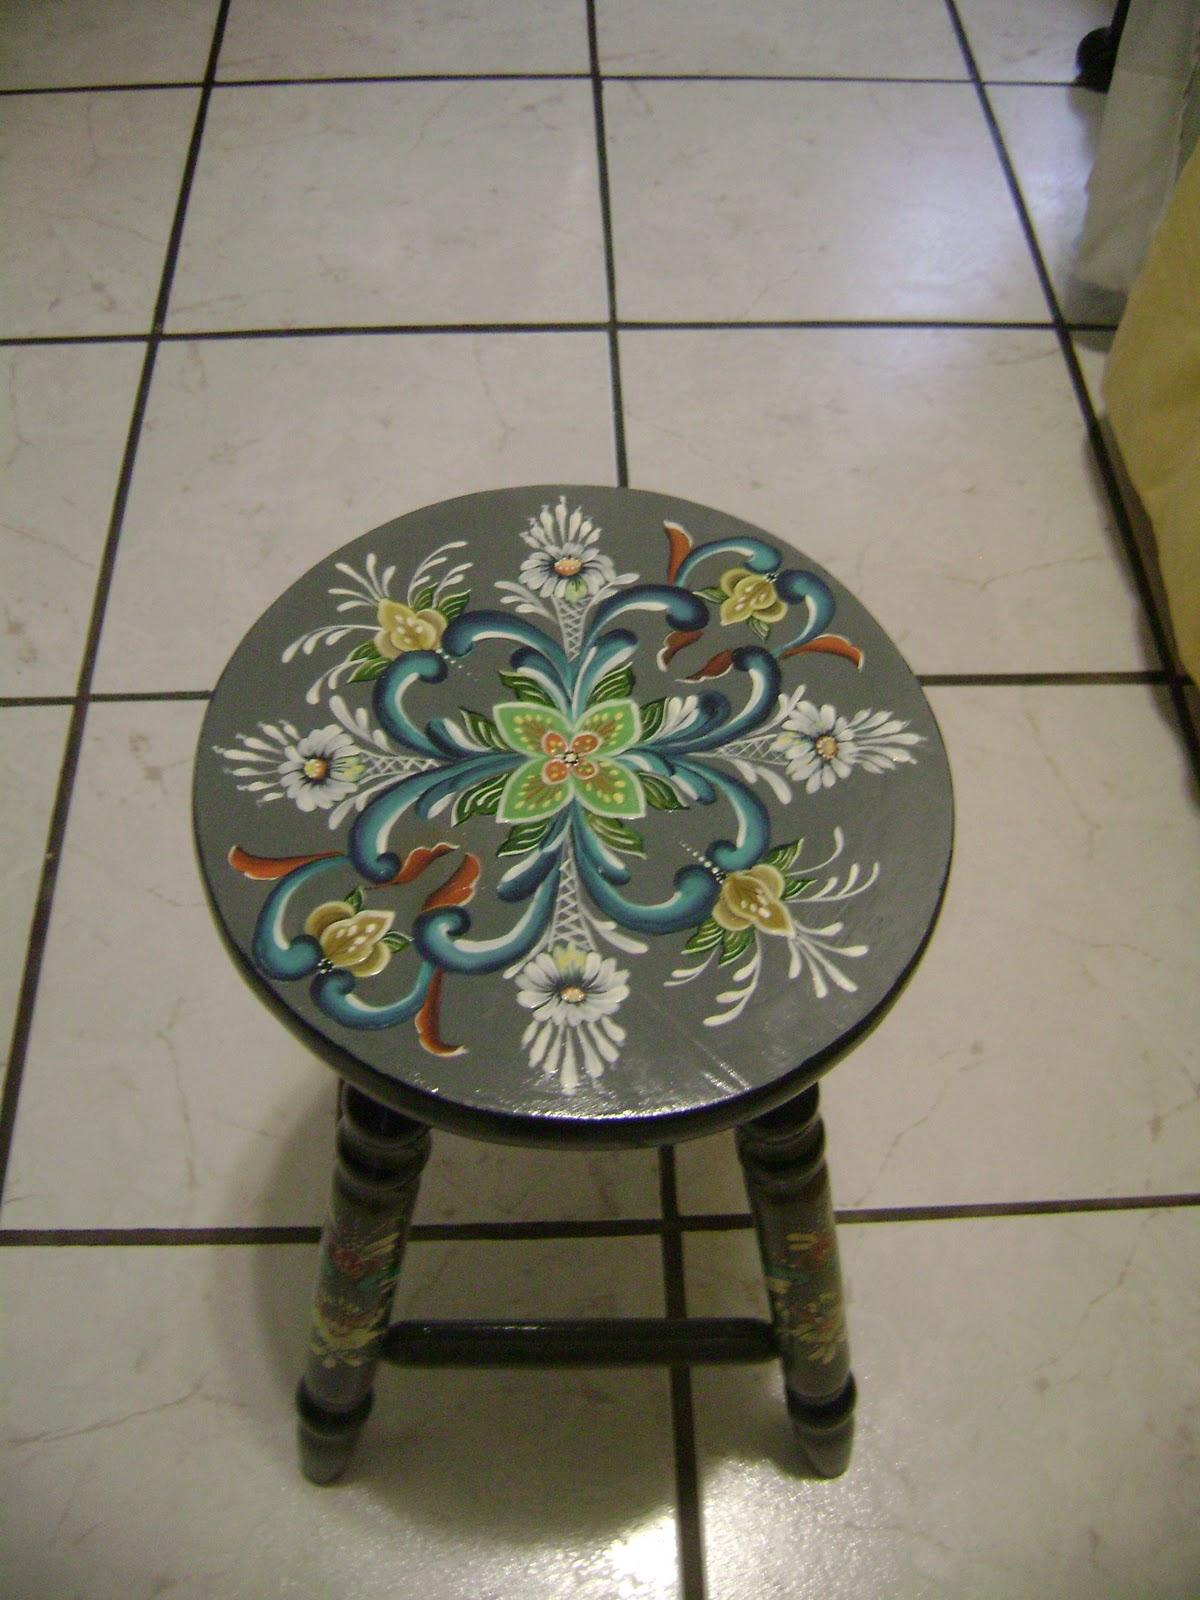 banco com a pintura Rosemaling(pintura decorativa originaria da  #5C4E38 1200x1600